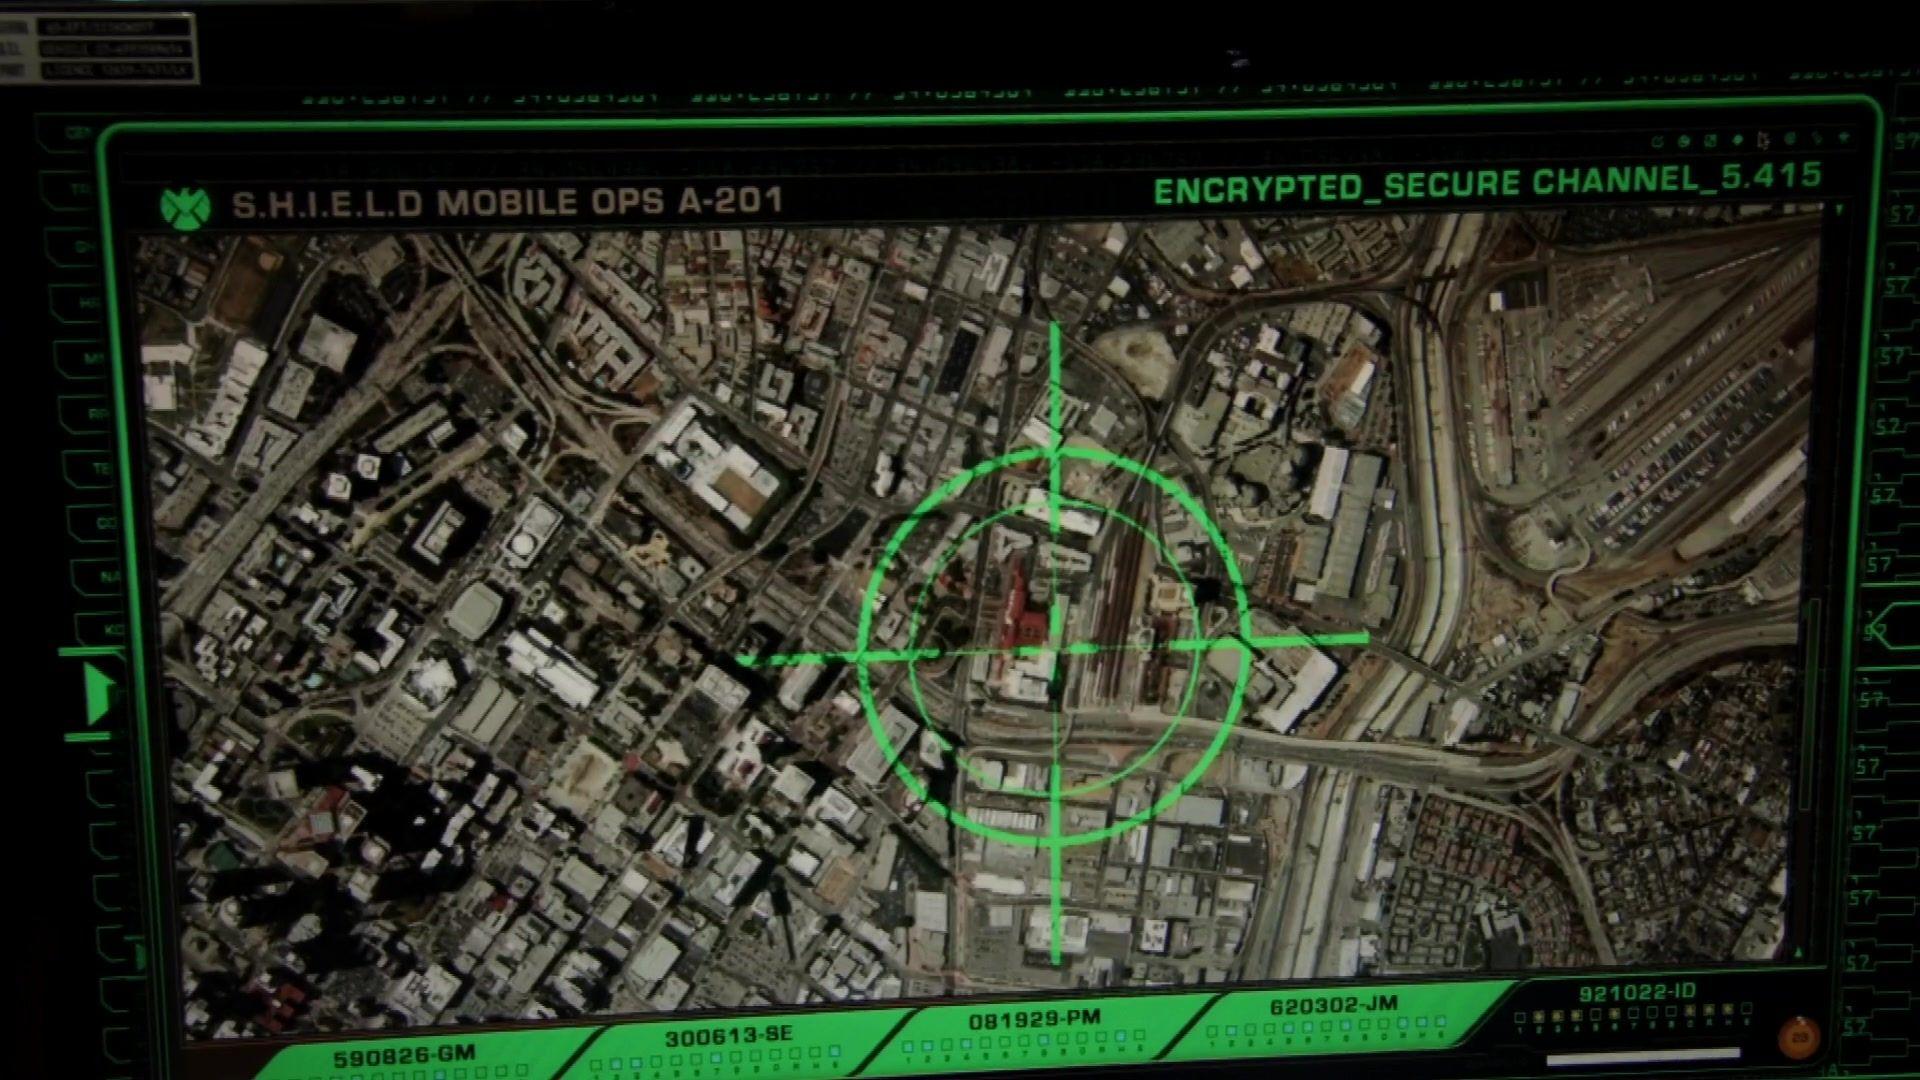 Episode 1: Pilot - Agents of S H I E L D S01E01 Pilot 1080p SCREENCAPS KISSTHEMGOODBYE NET 1329 - Agents of S.H.I.E.L.D. Screencaps